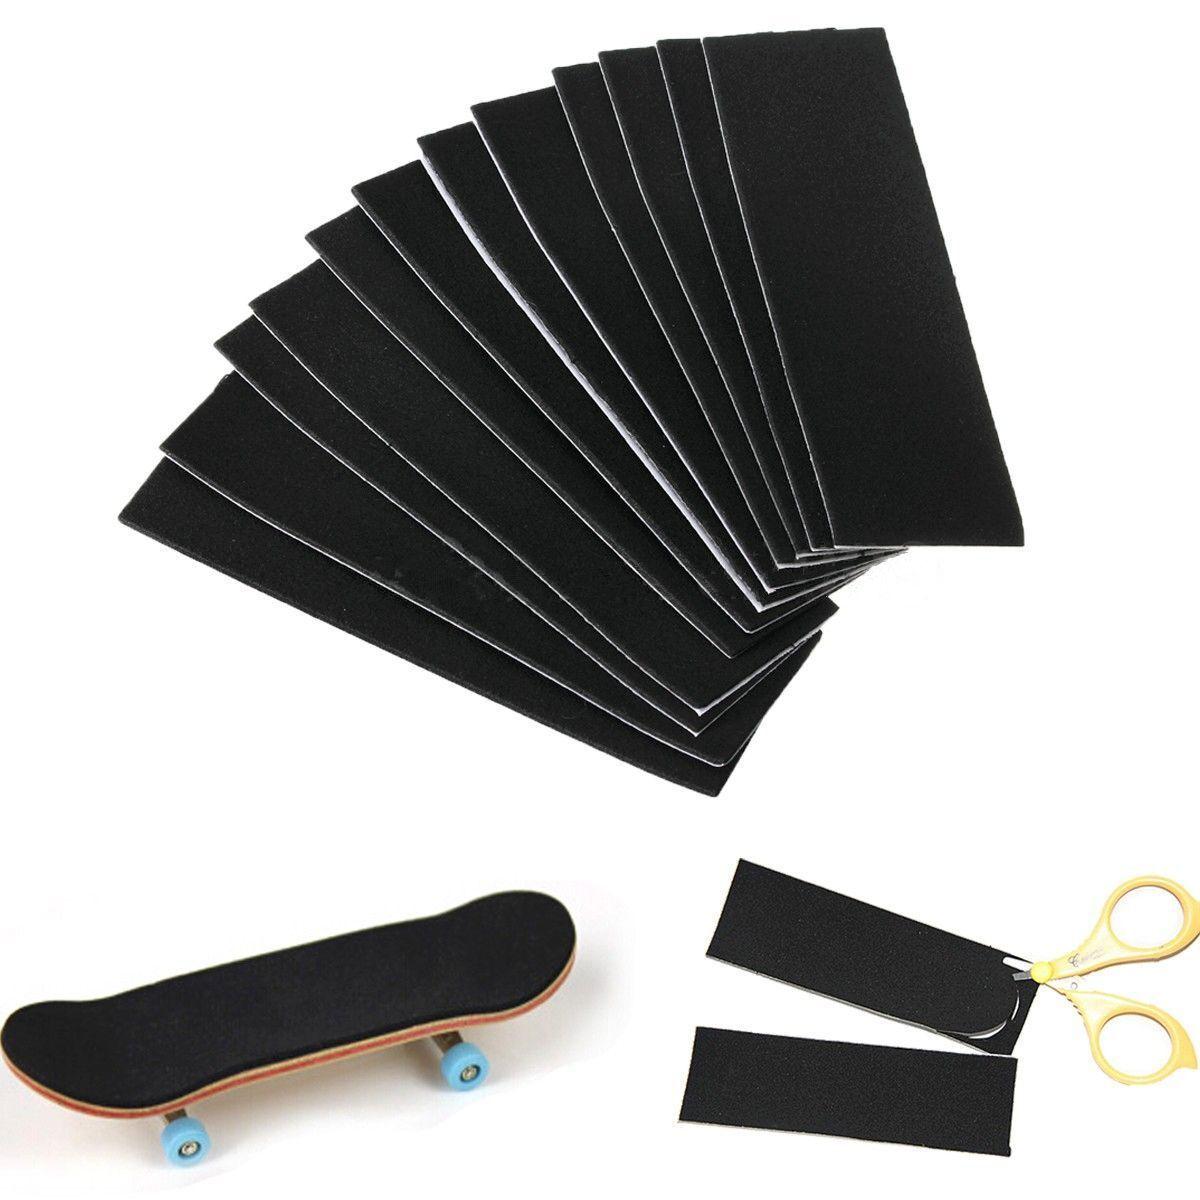 "Lote de 12 unidades de cinta antideslizante para agarre de papel de lija sin cortar con diapasón de madera, 110X3, 5mm/4,33 ""x 1,38"", de espuma para monopatín"